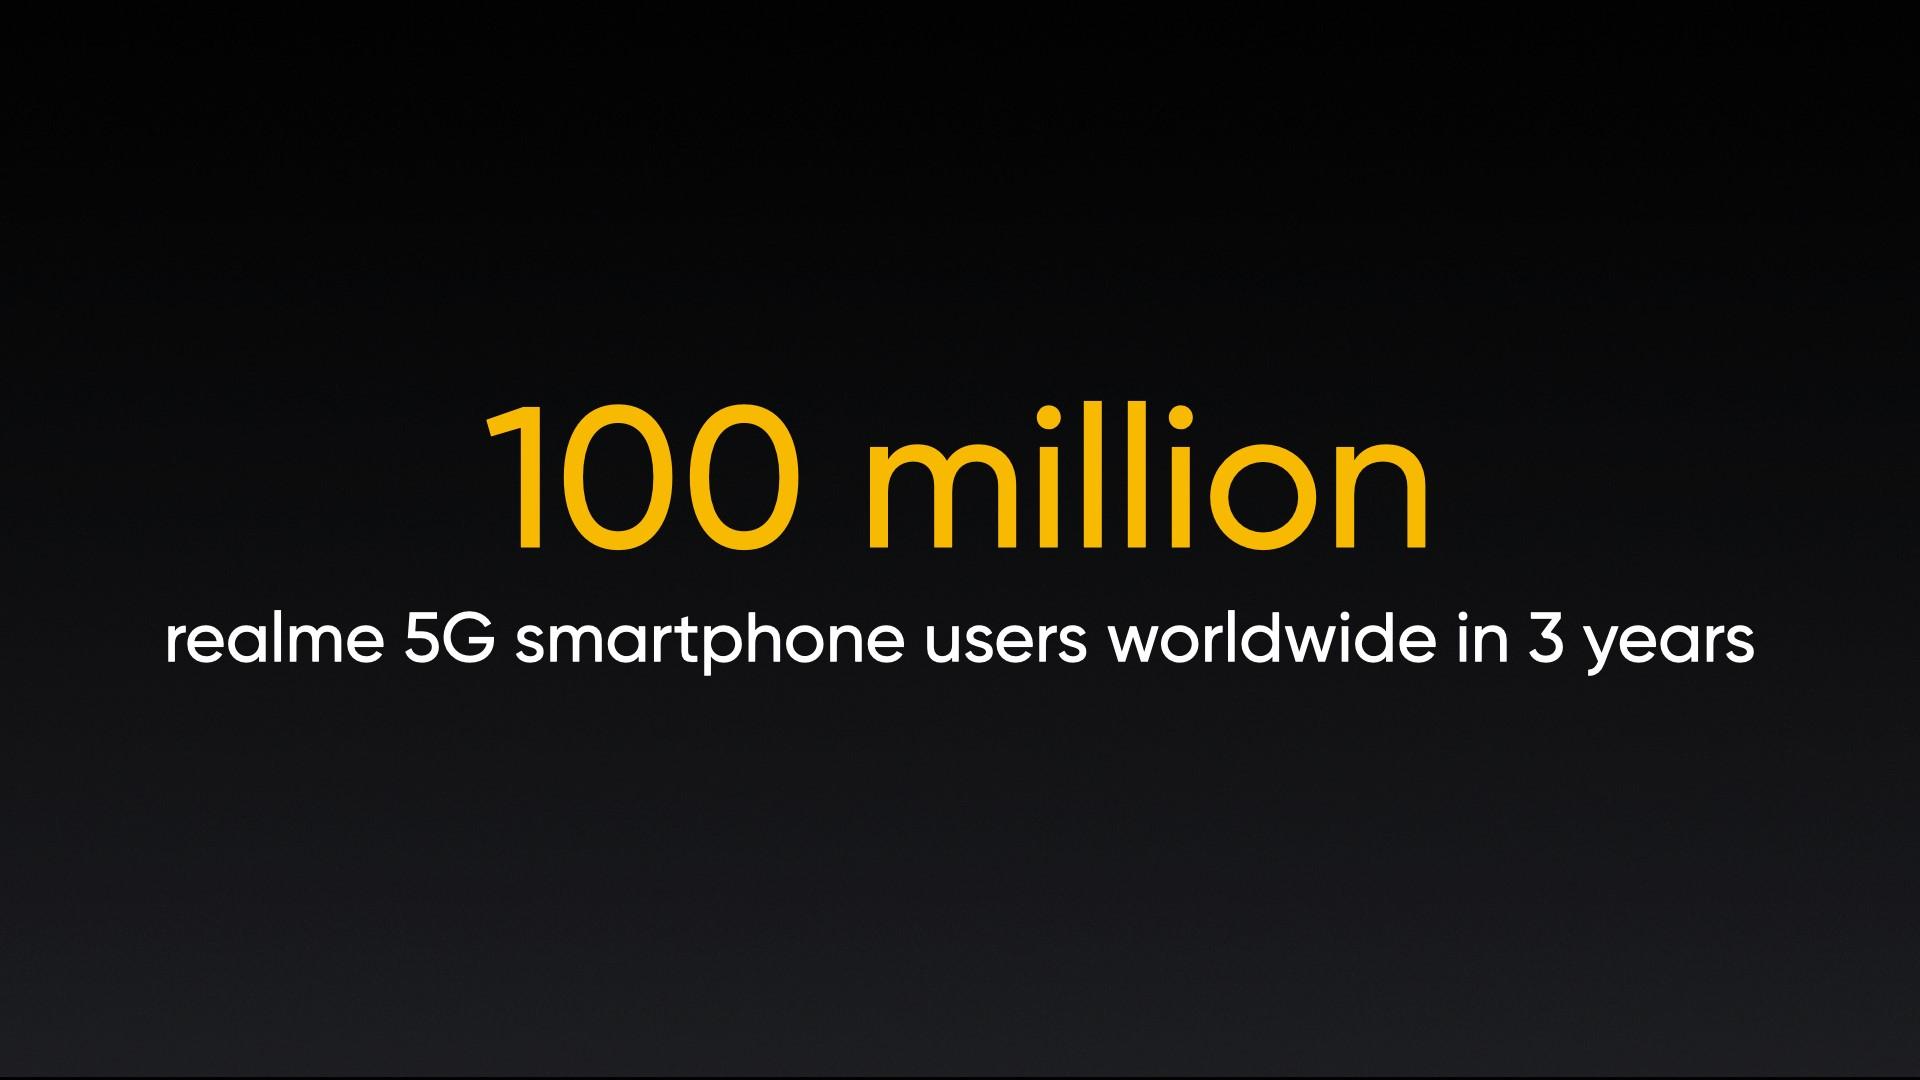 realme 8 5G 搭载DRE动态内存拓展技术,如今可以在Celcom签购并获取免费手机! 1